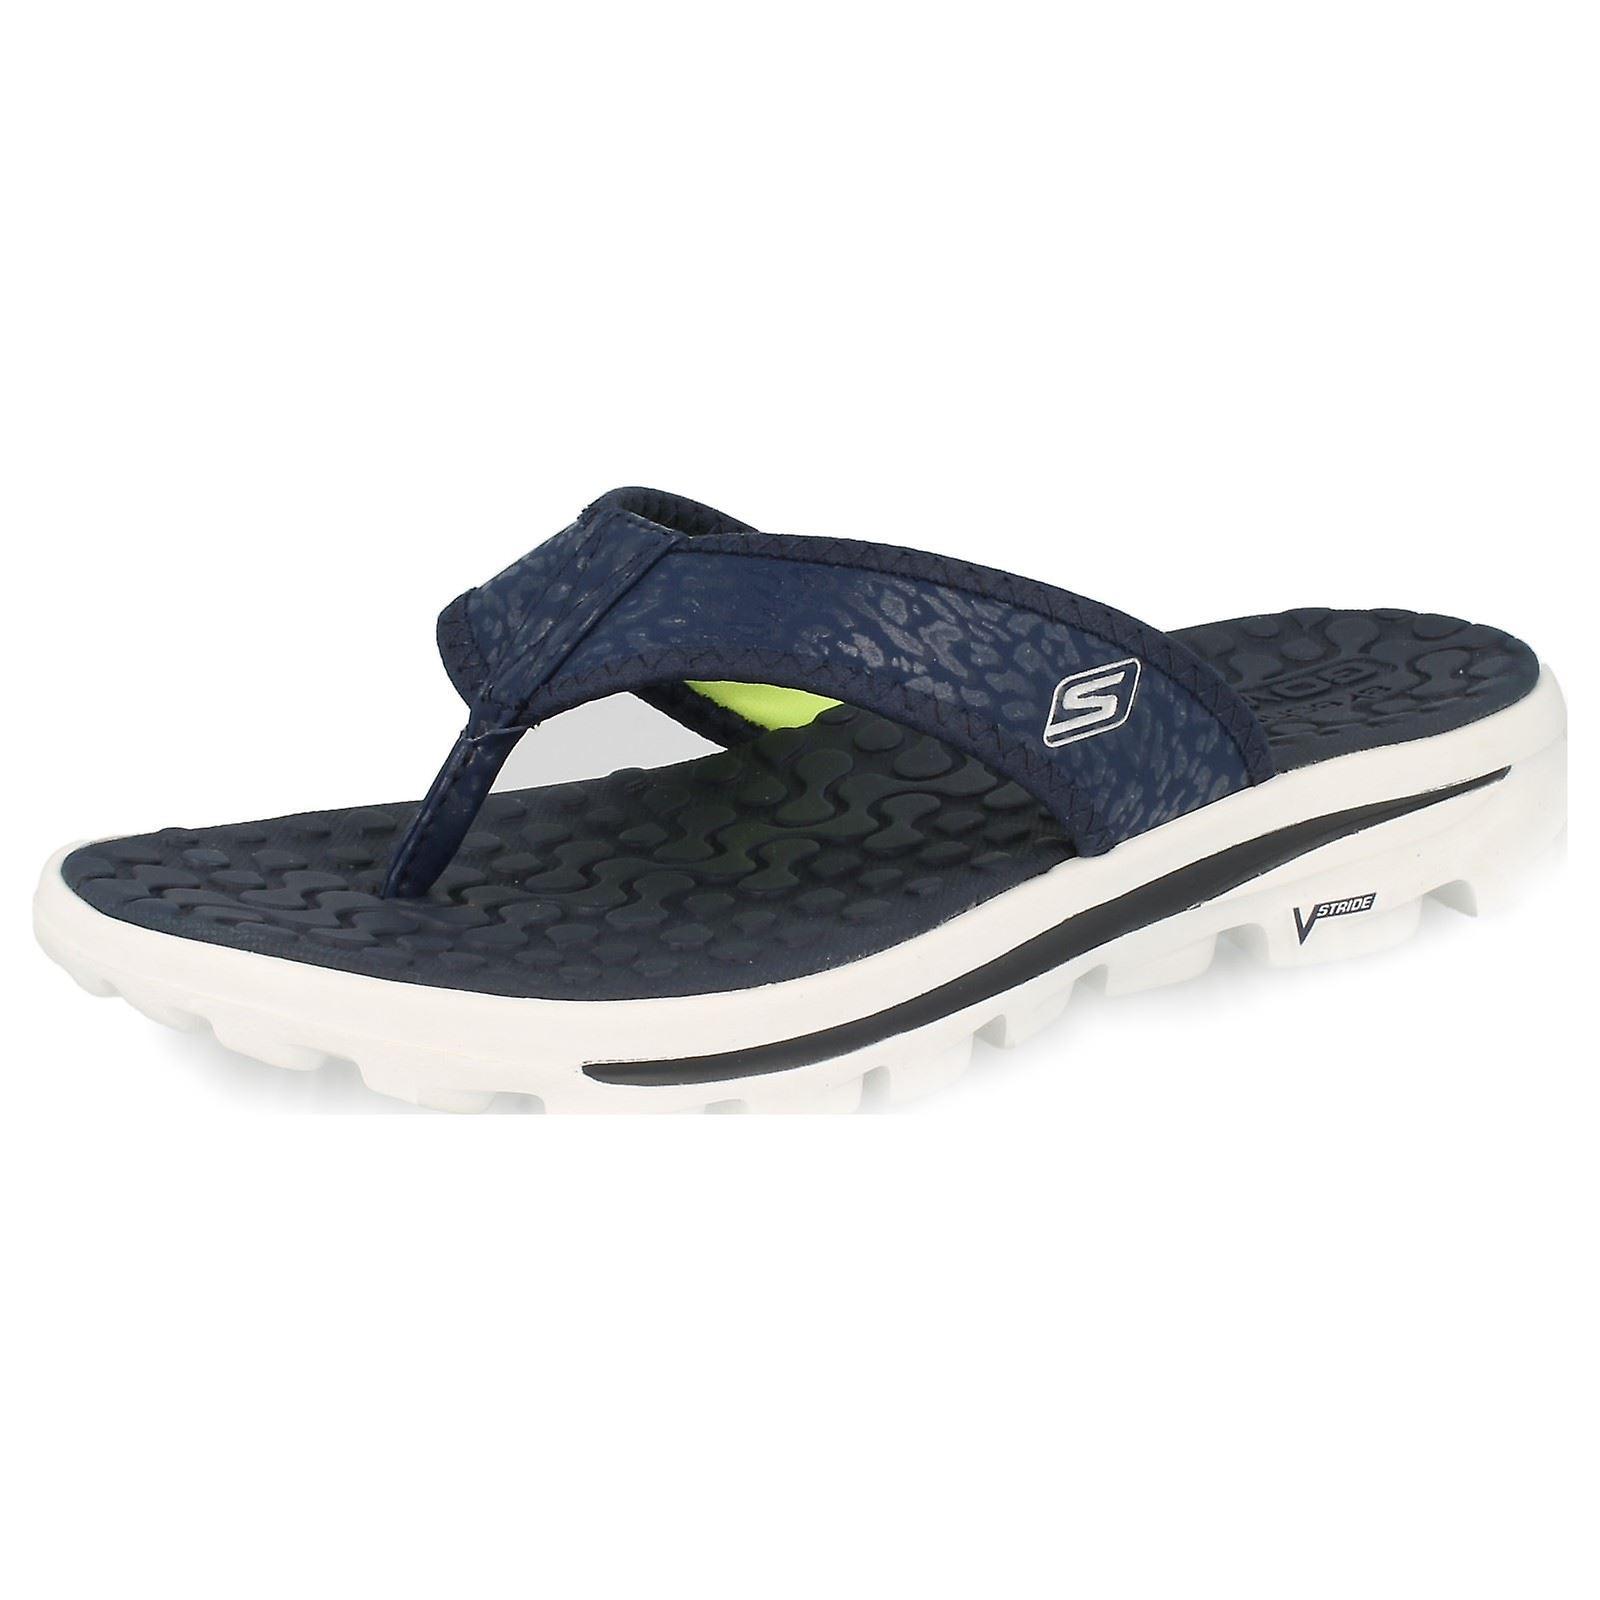 Ladies Skechers GoWalk Toe Post Sandals 'Beach Bum' P7xM9